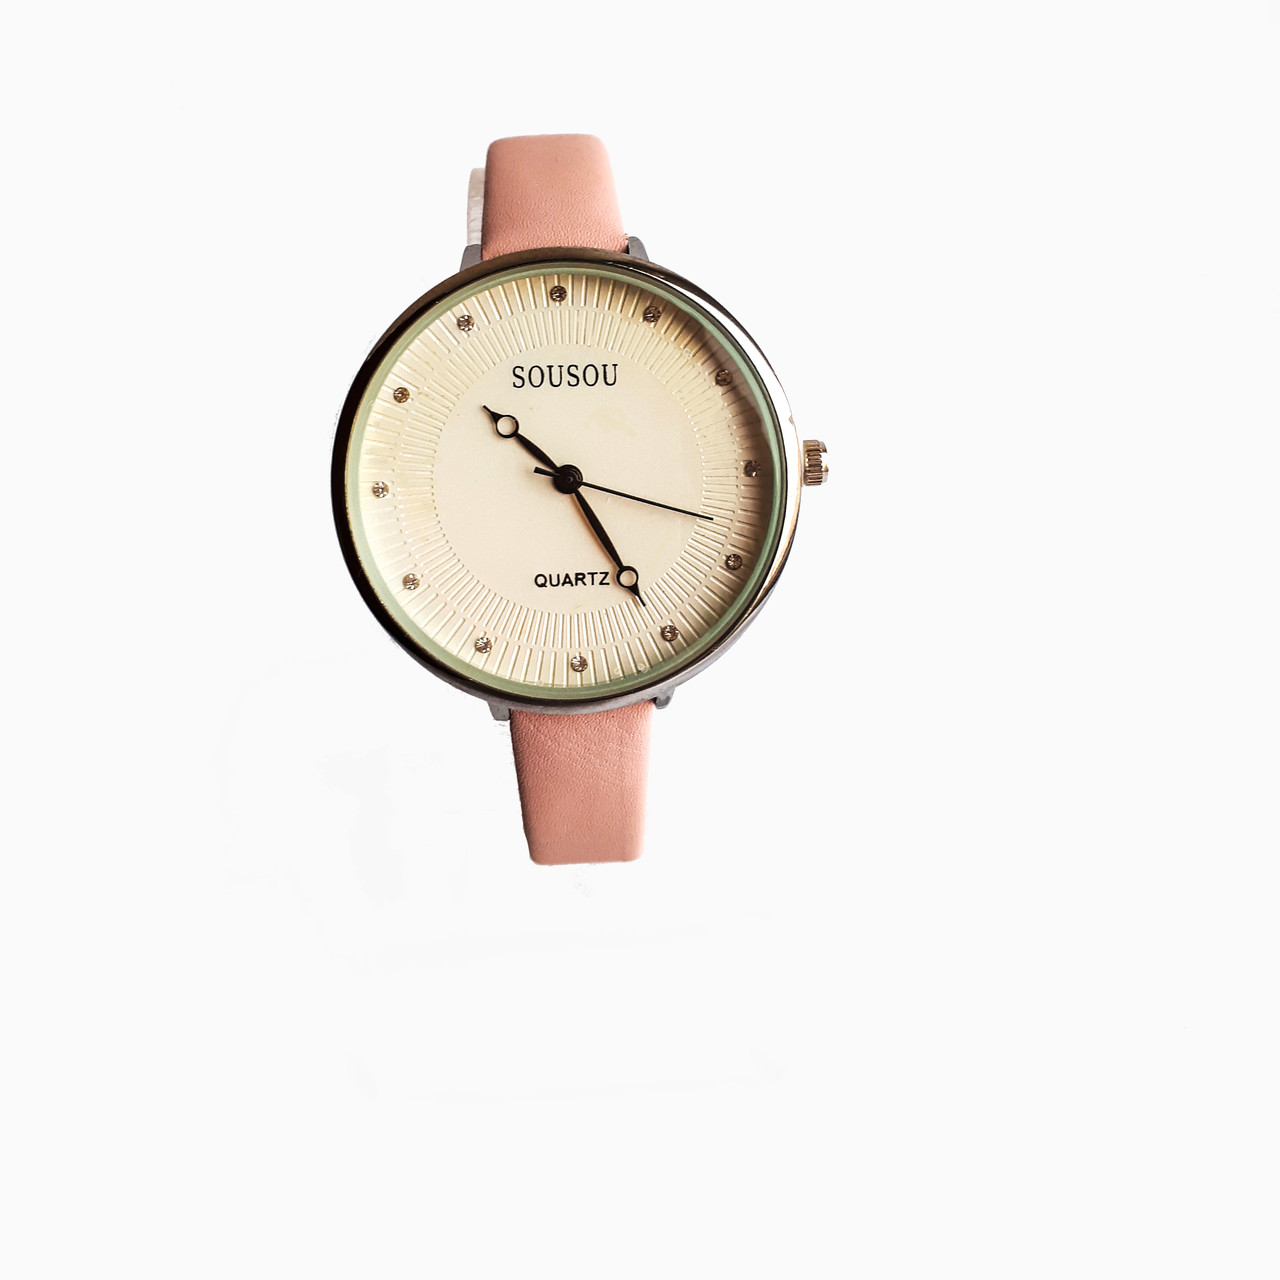 Часы женские Sou Sou shine кварцевые  на  ремешках Розовый